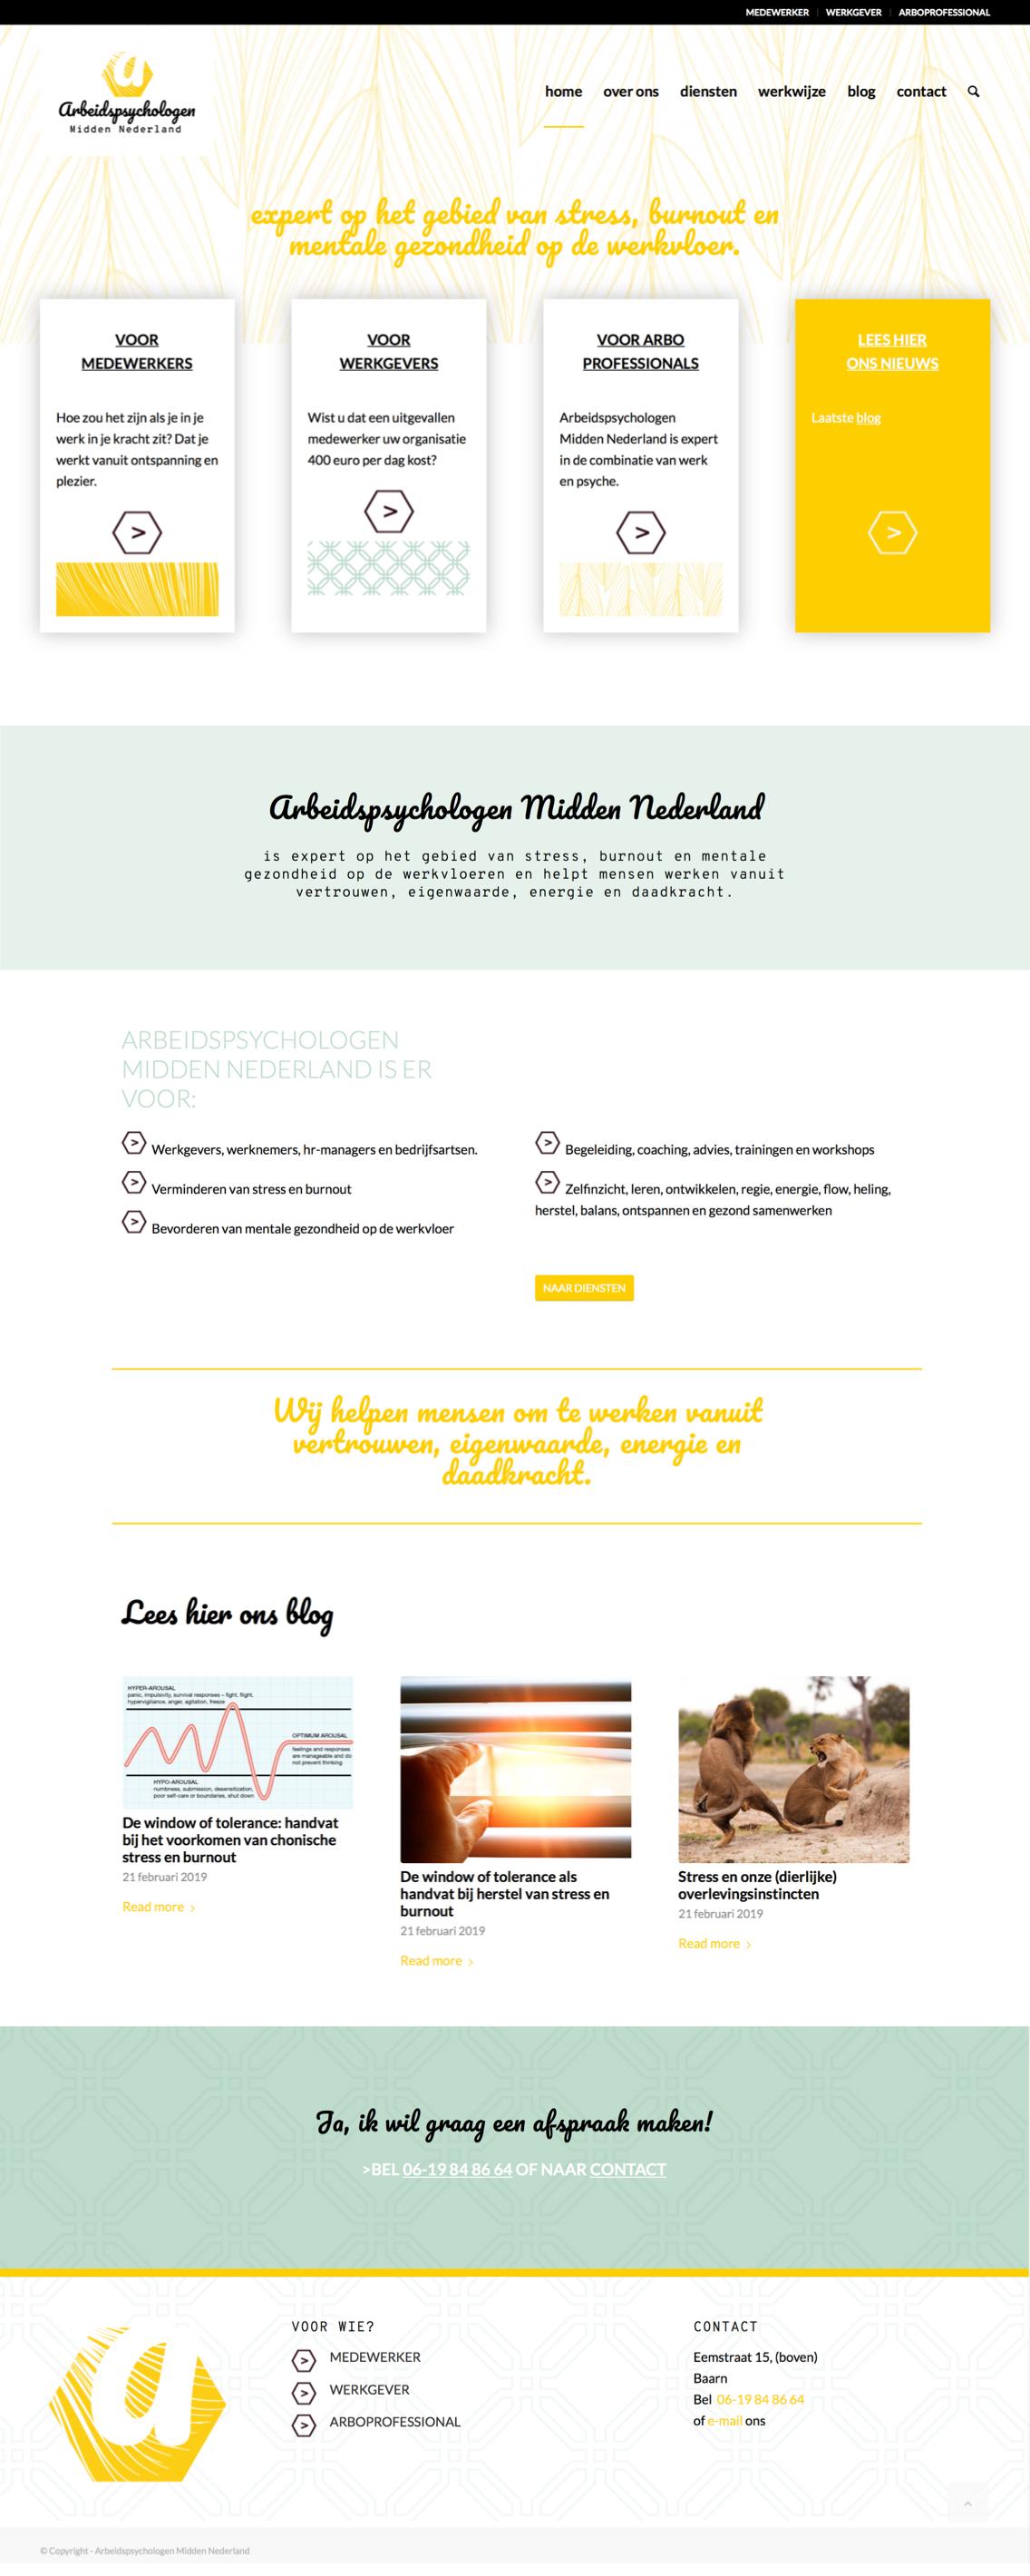 Arbeidspsychologen Midden Nederland Homepagina